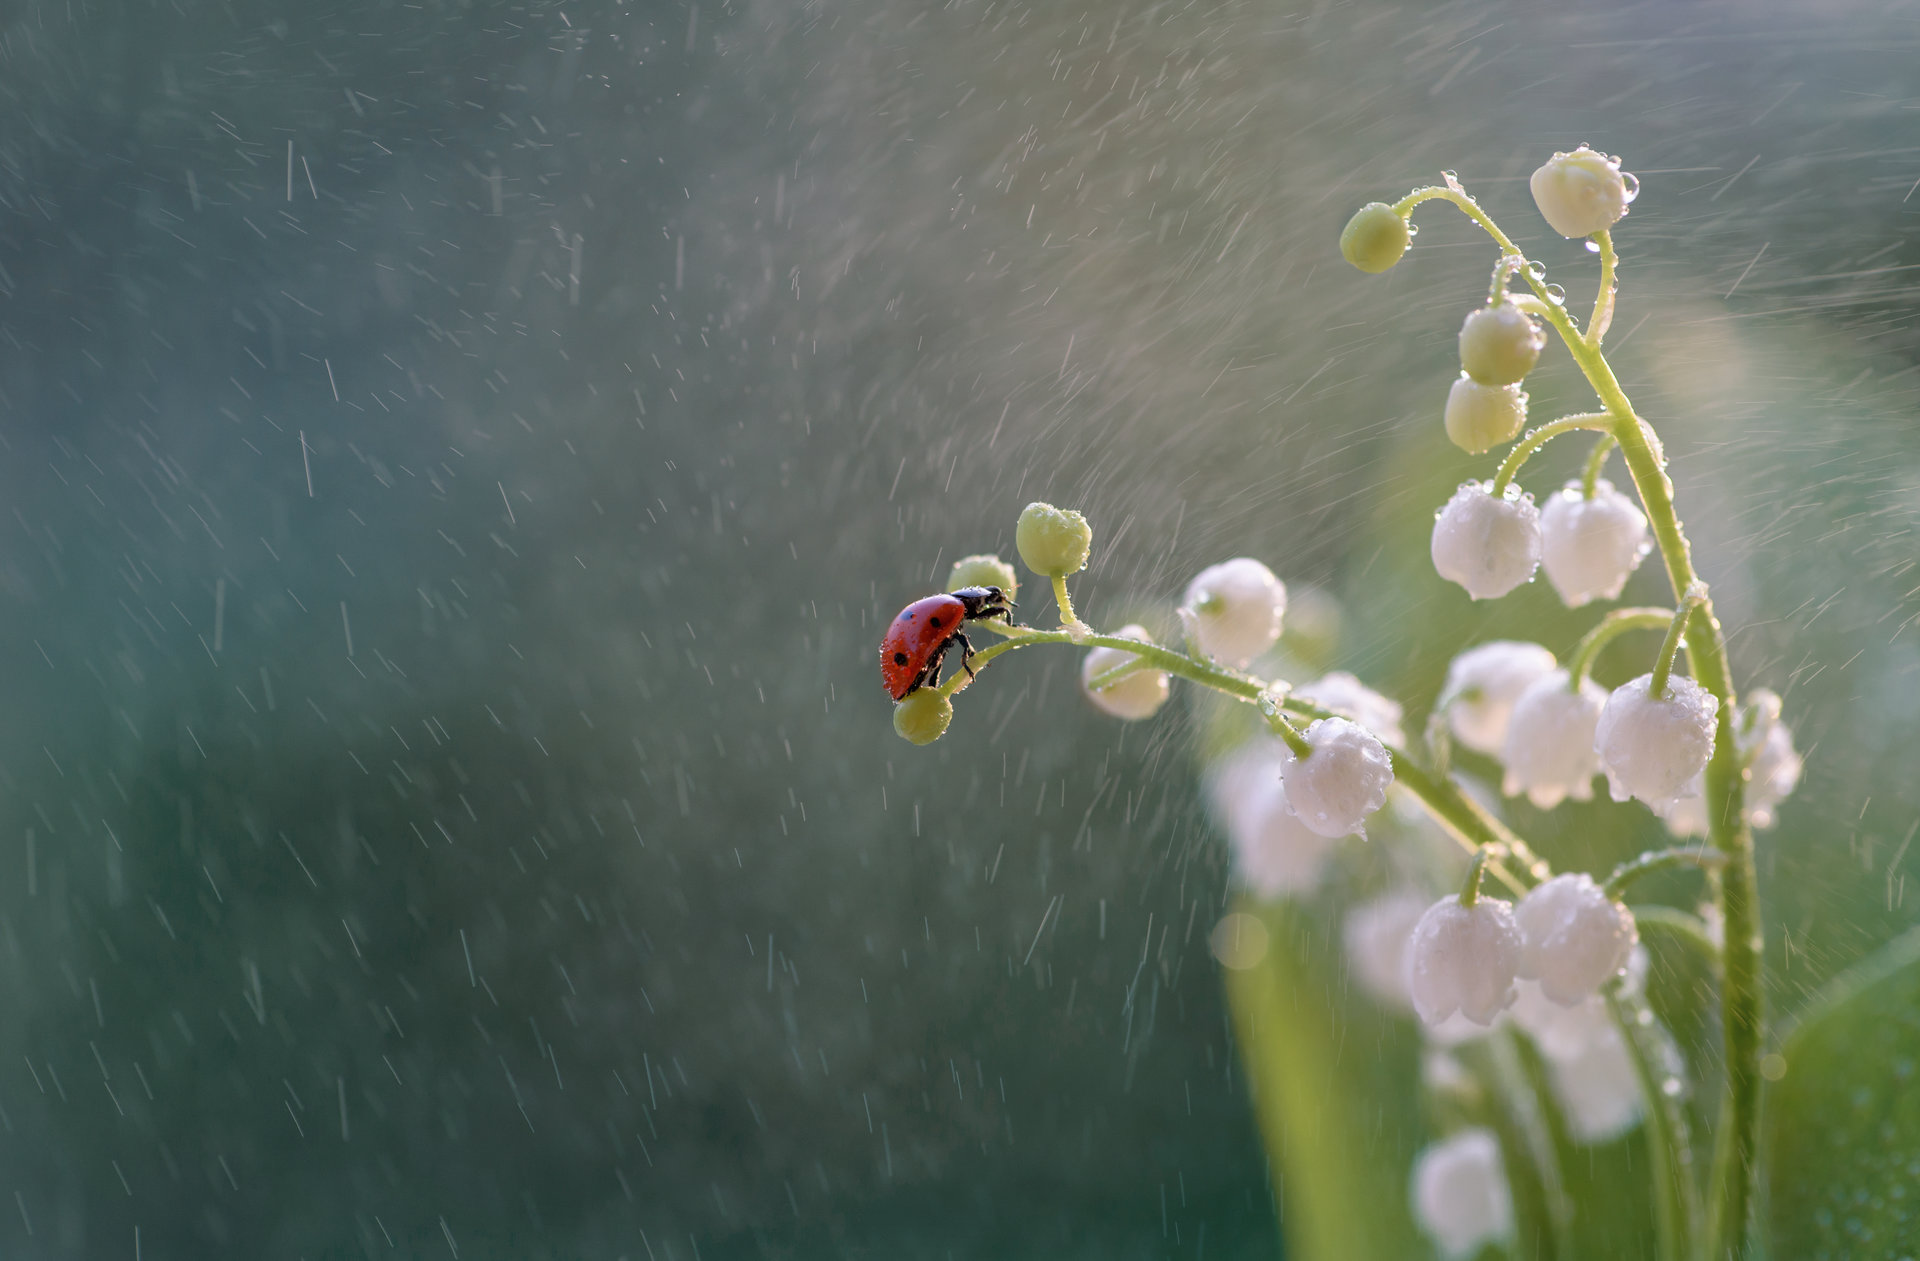 Photo in Macro | Author Tanq Markova - Nyamarkova | PHOTO FORUM